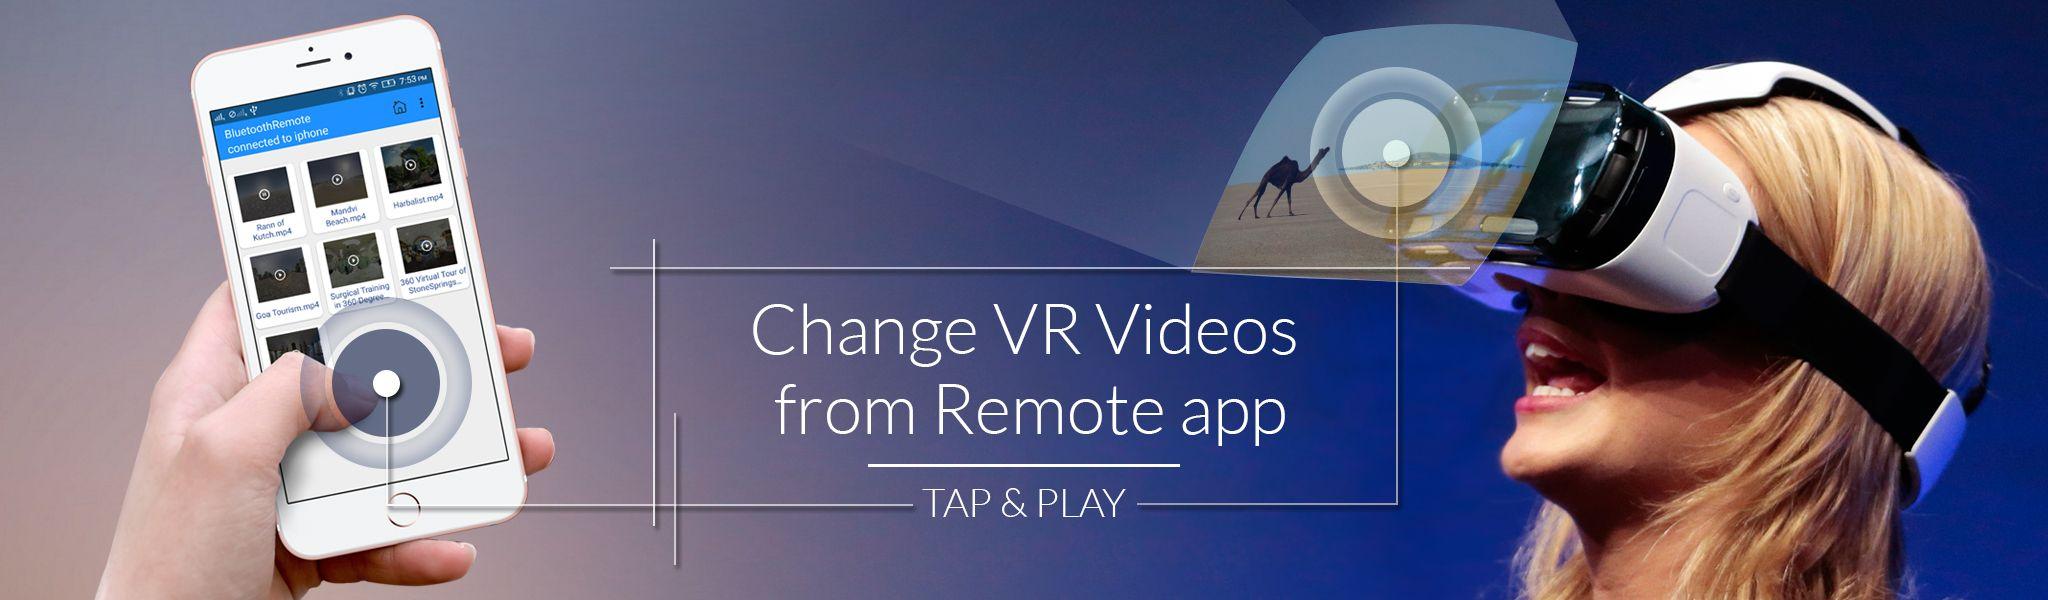 VR Player Remote App Development Company USA Virtual